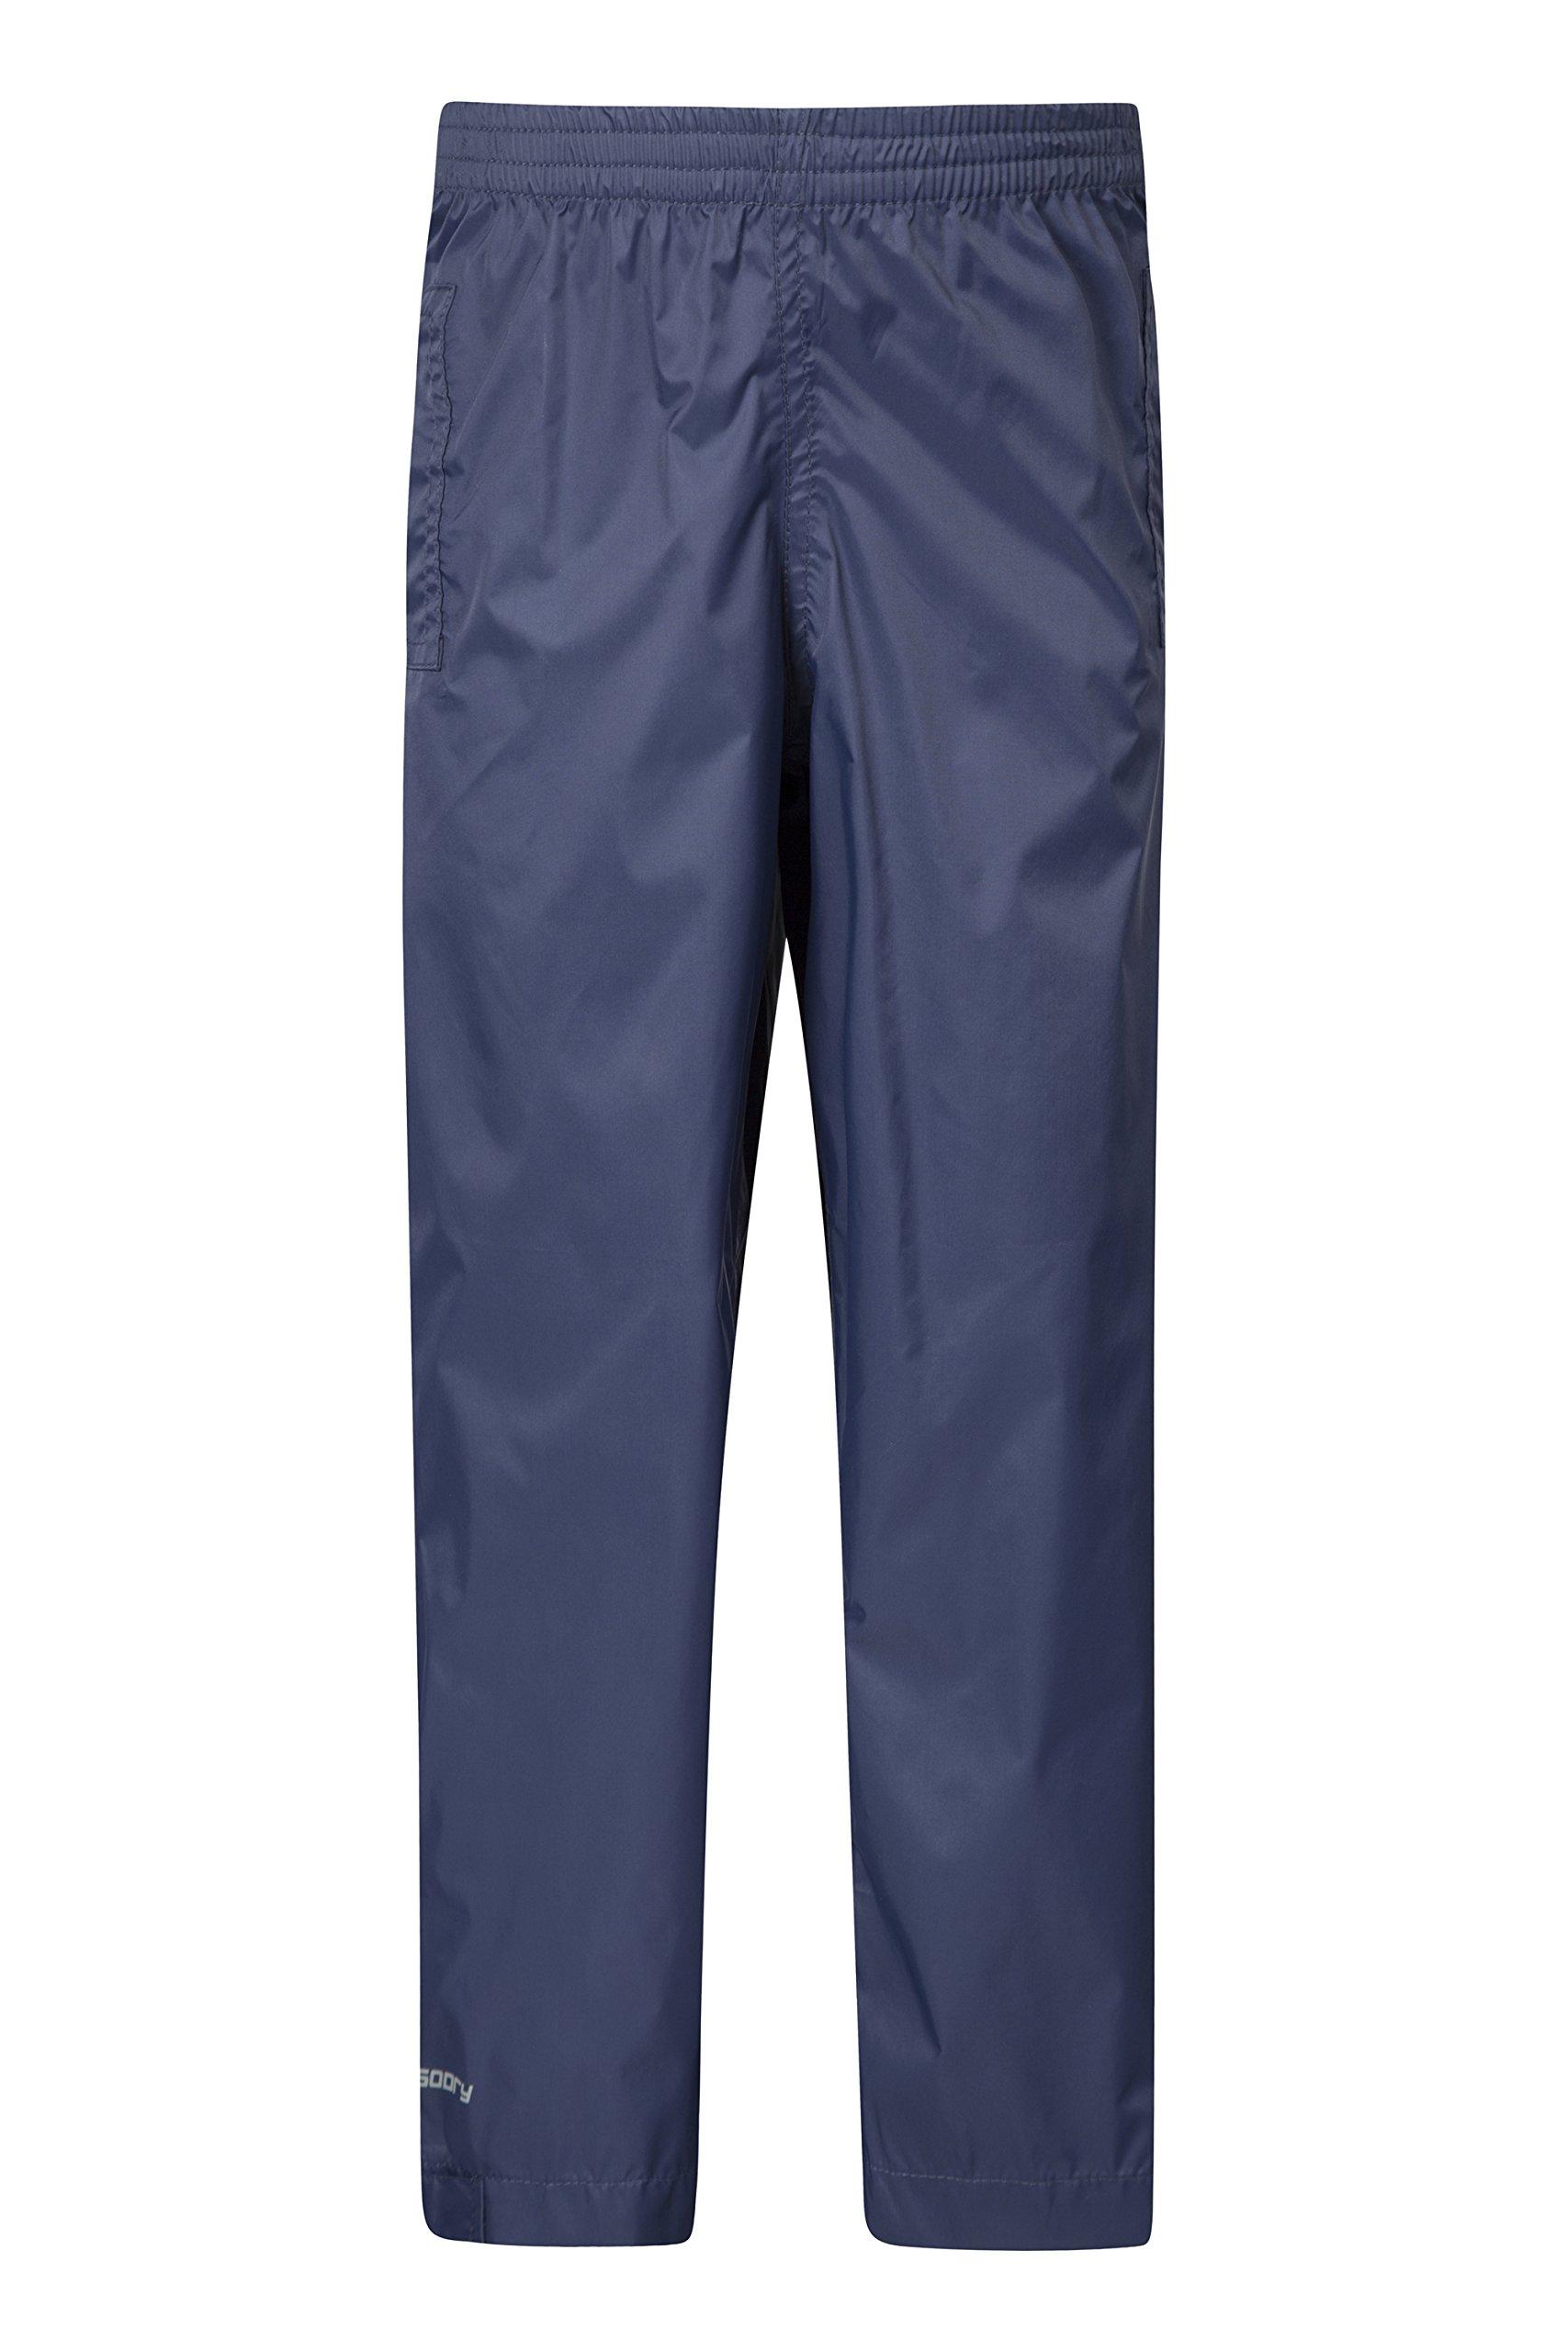 Mountain Warehouse Pakka Kids Rain Pants -Waterproof Packable Bottoms Navy 11-12 years